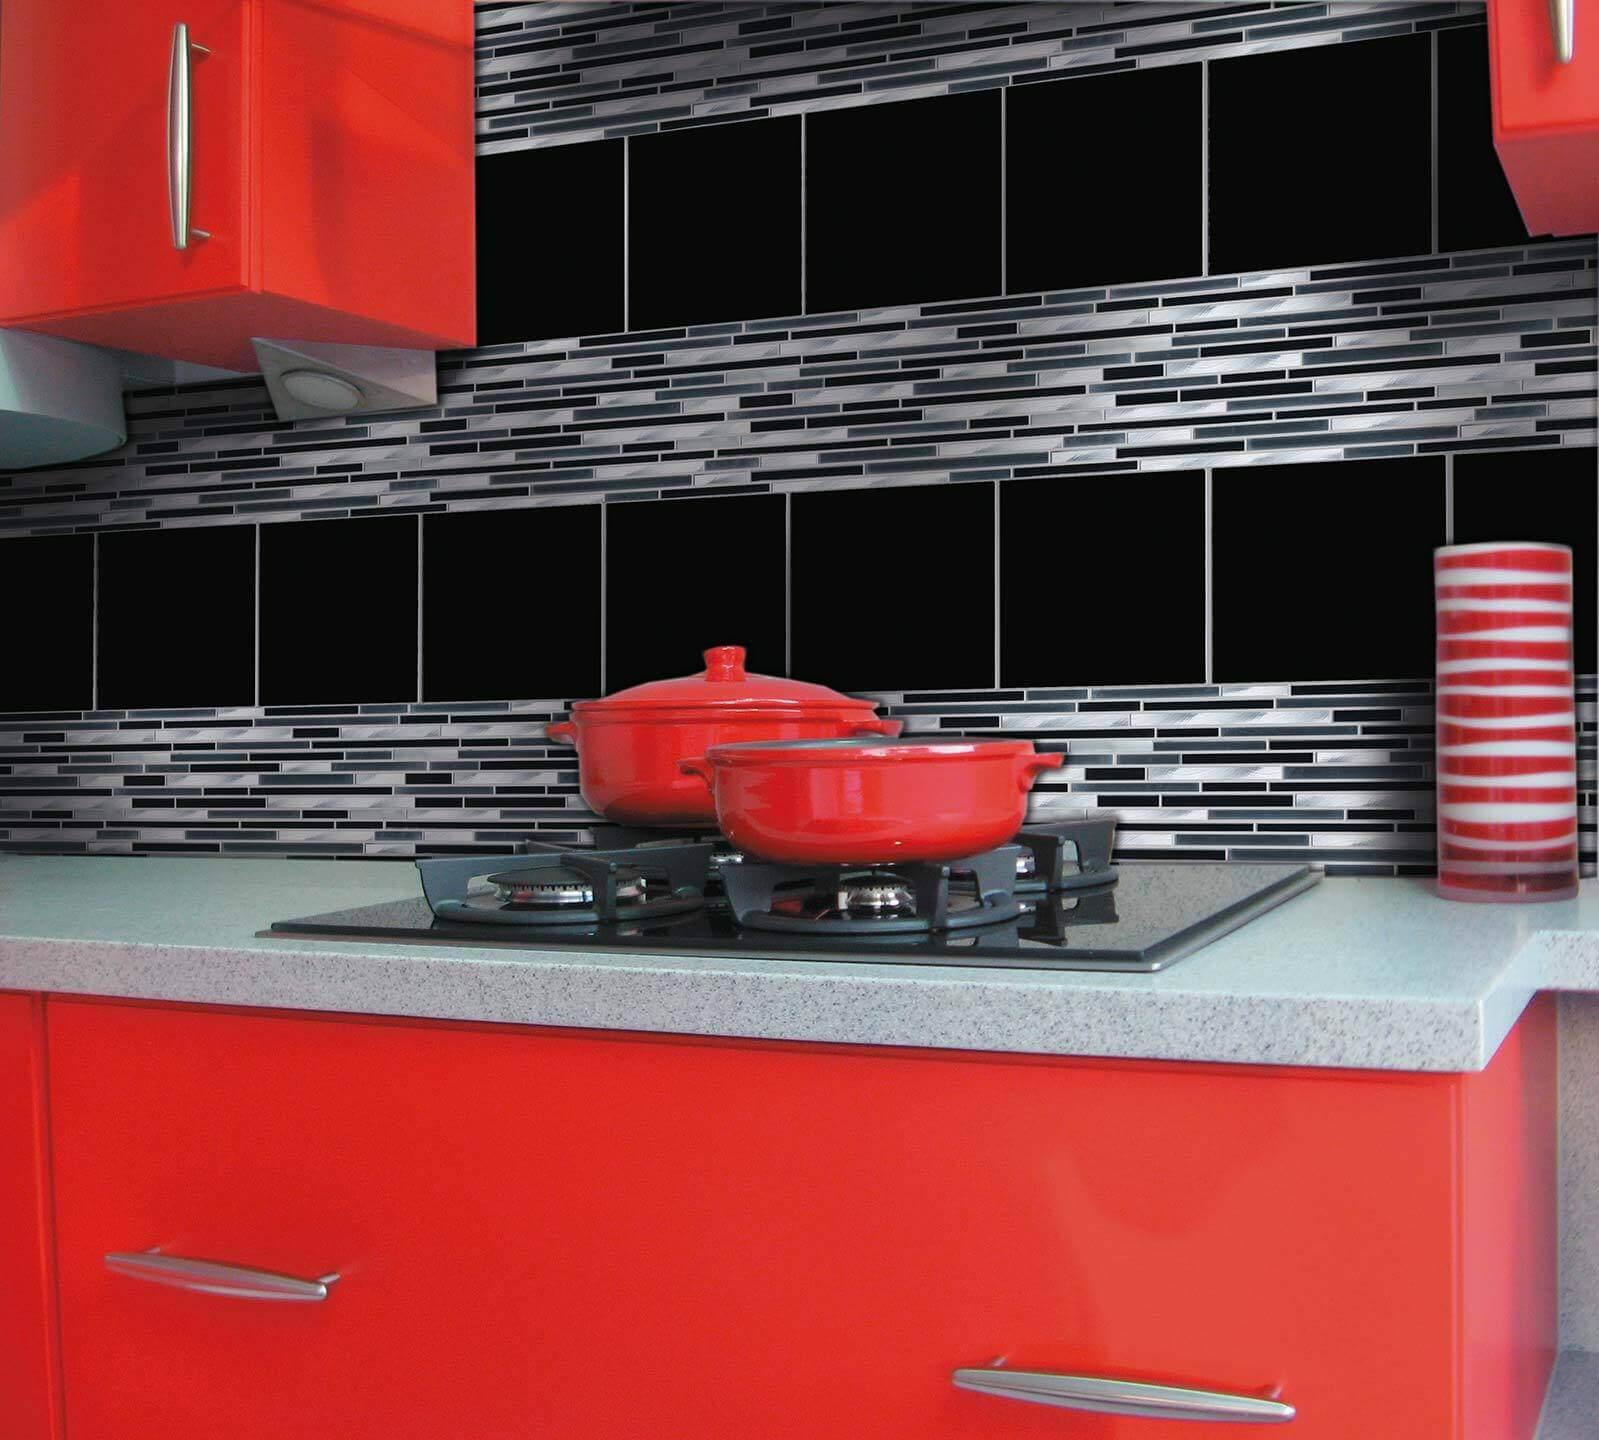 Fran-Char stix black and white mosaic tiles used as kitchen tiles